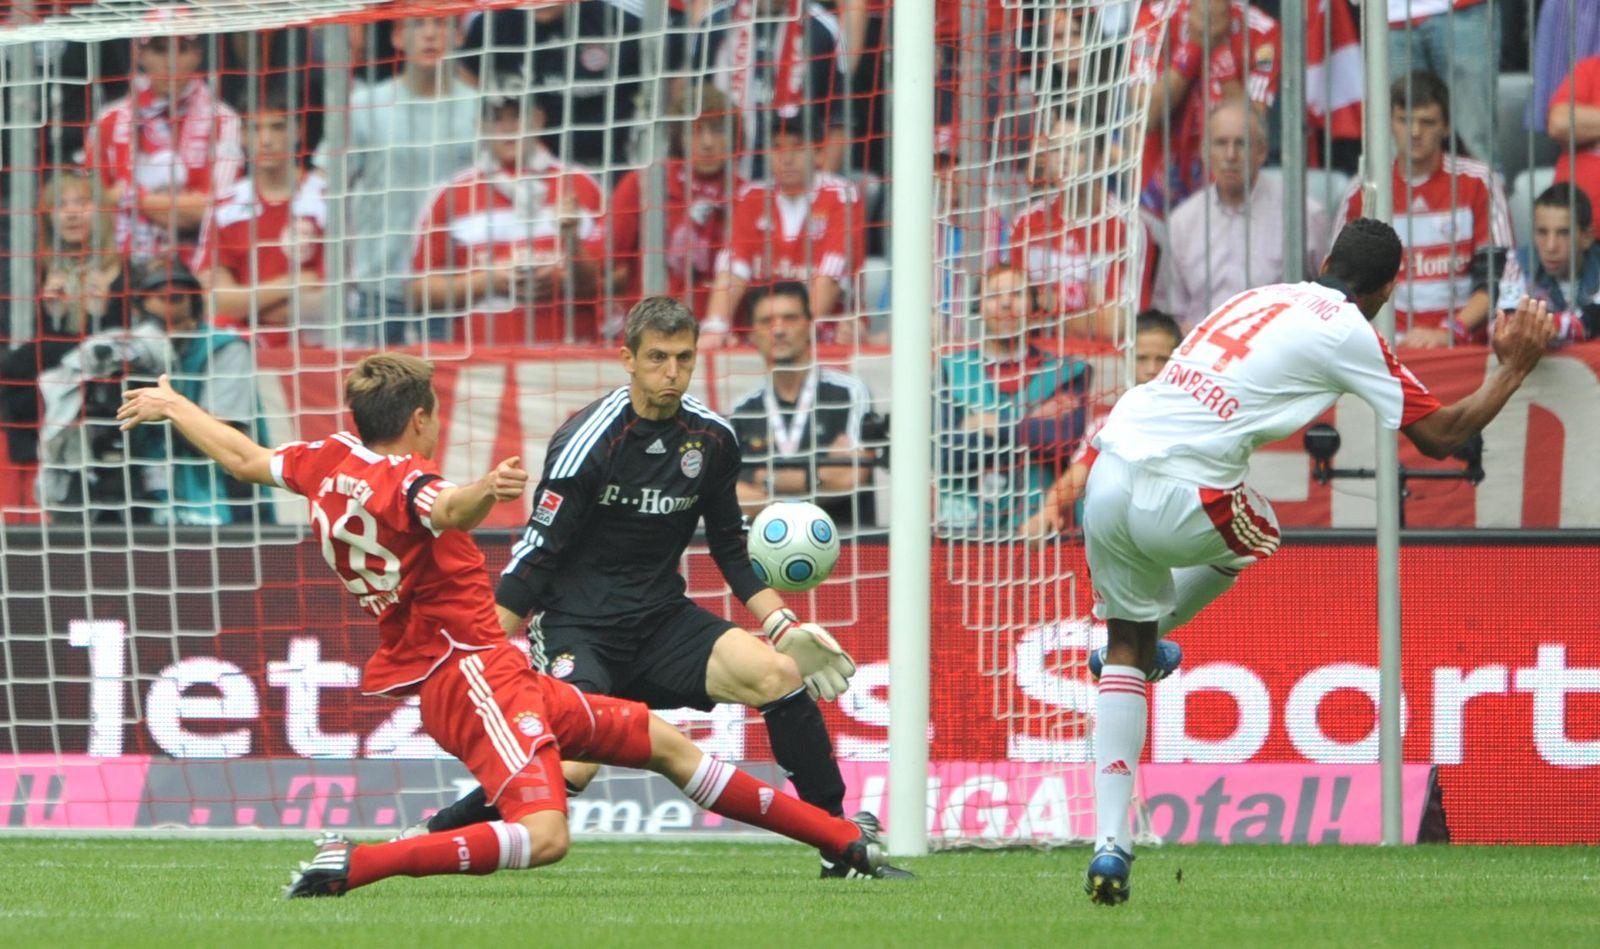 Moting gegen Bayern